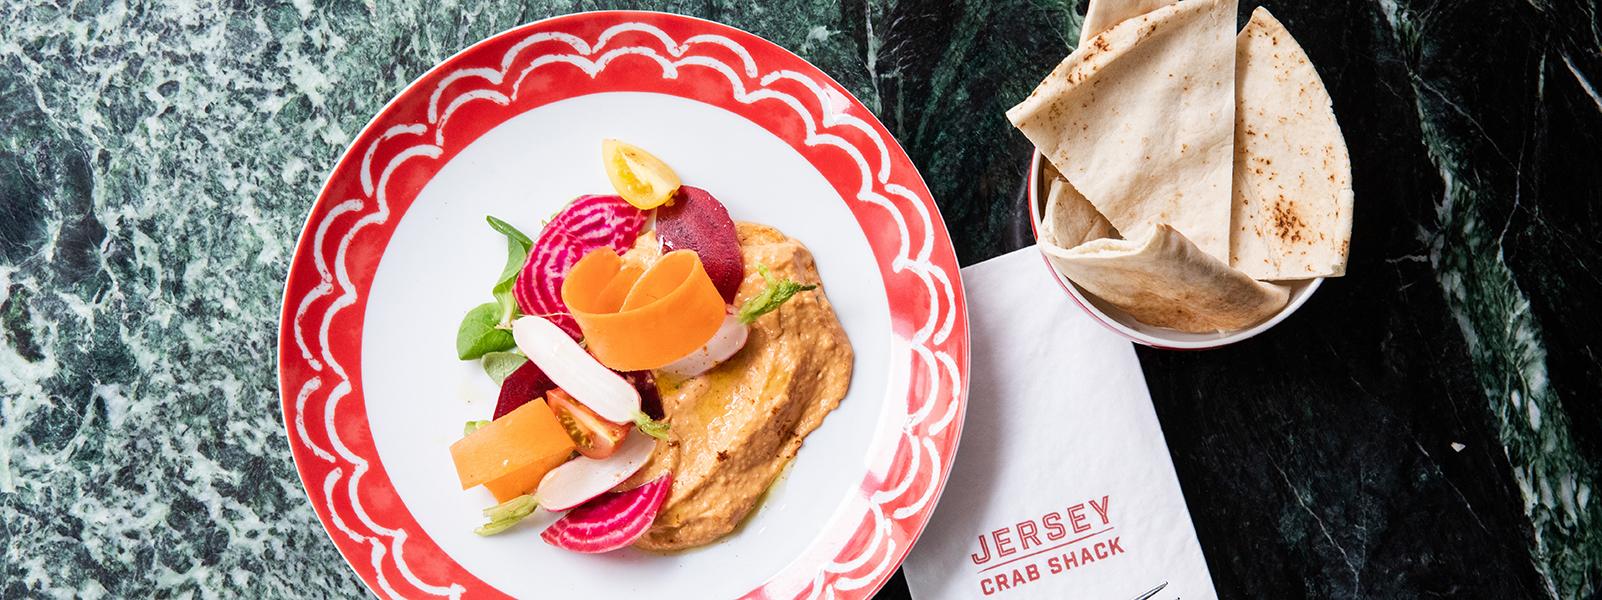 New Items JPRestaurants Jersey